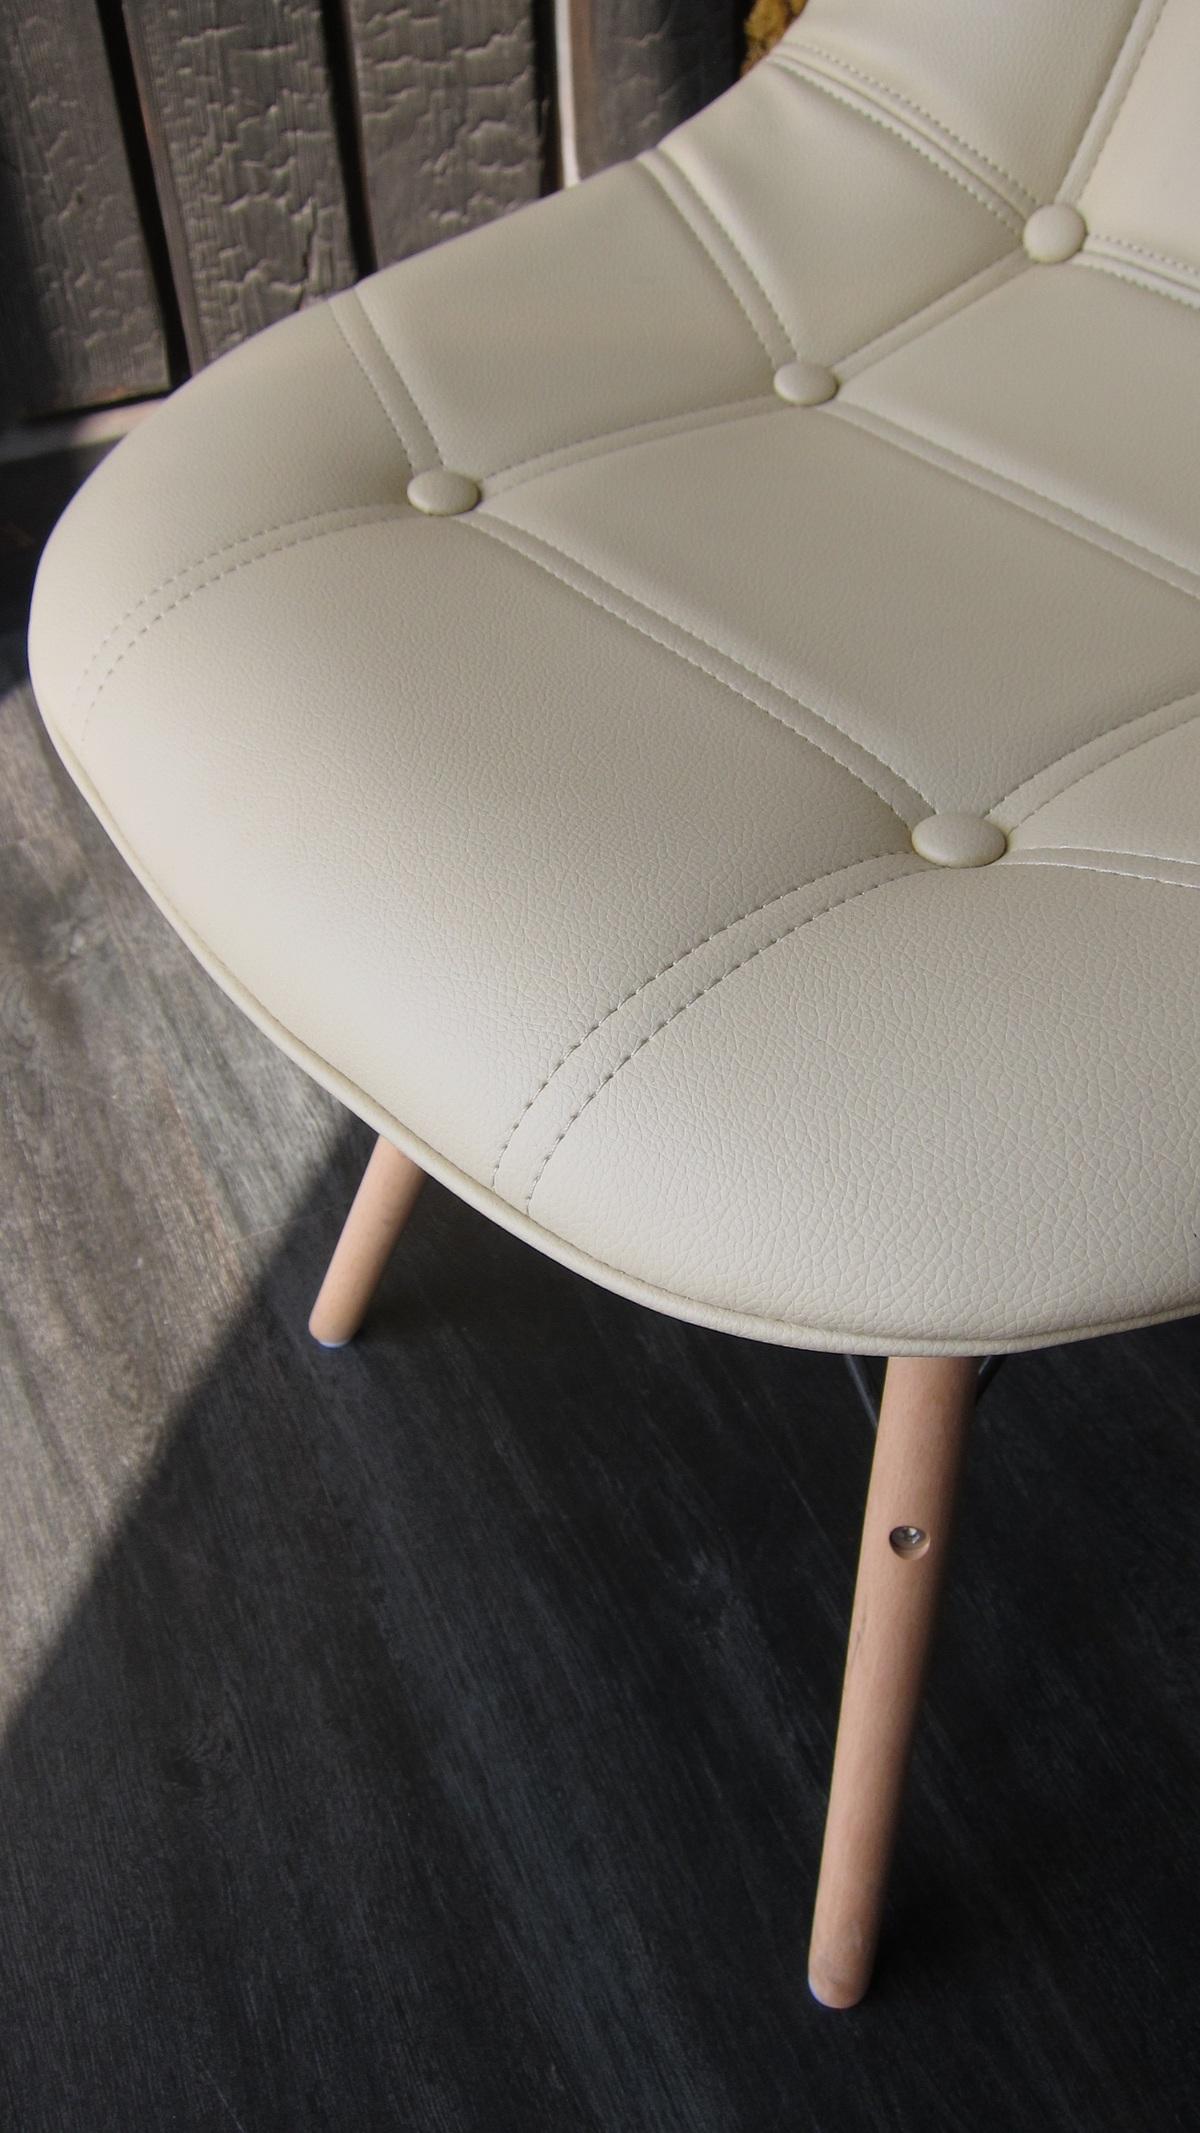 Eames DSW Chair (обивка)